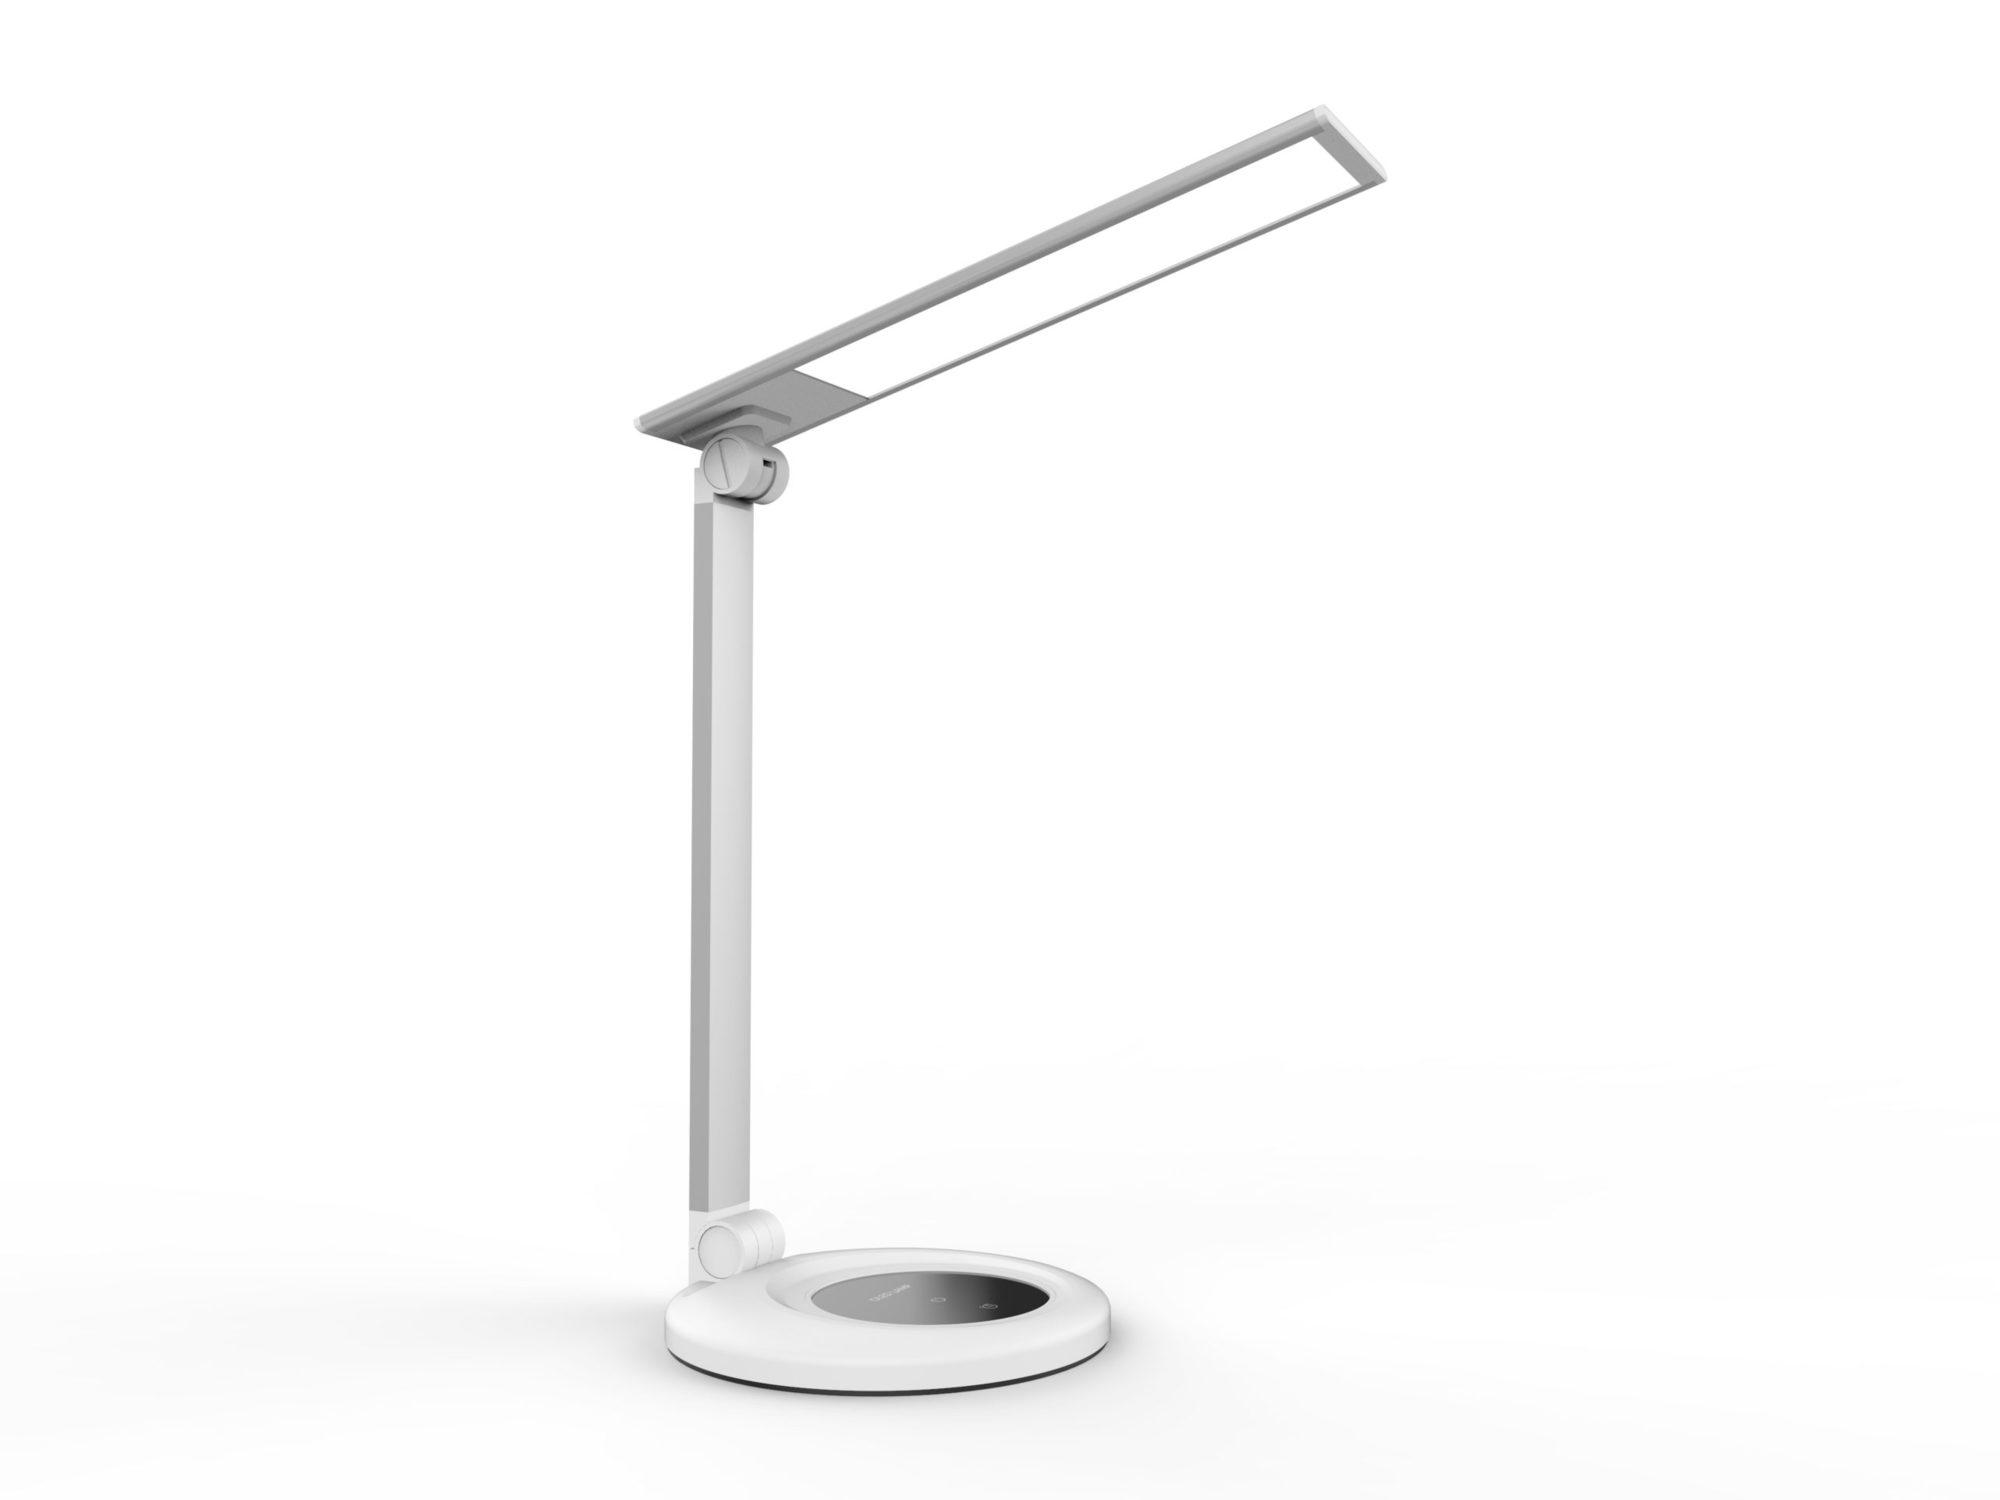 Jiangsu First Light C-1 Table Lamp